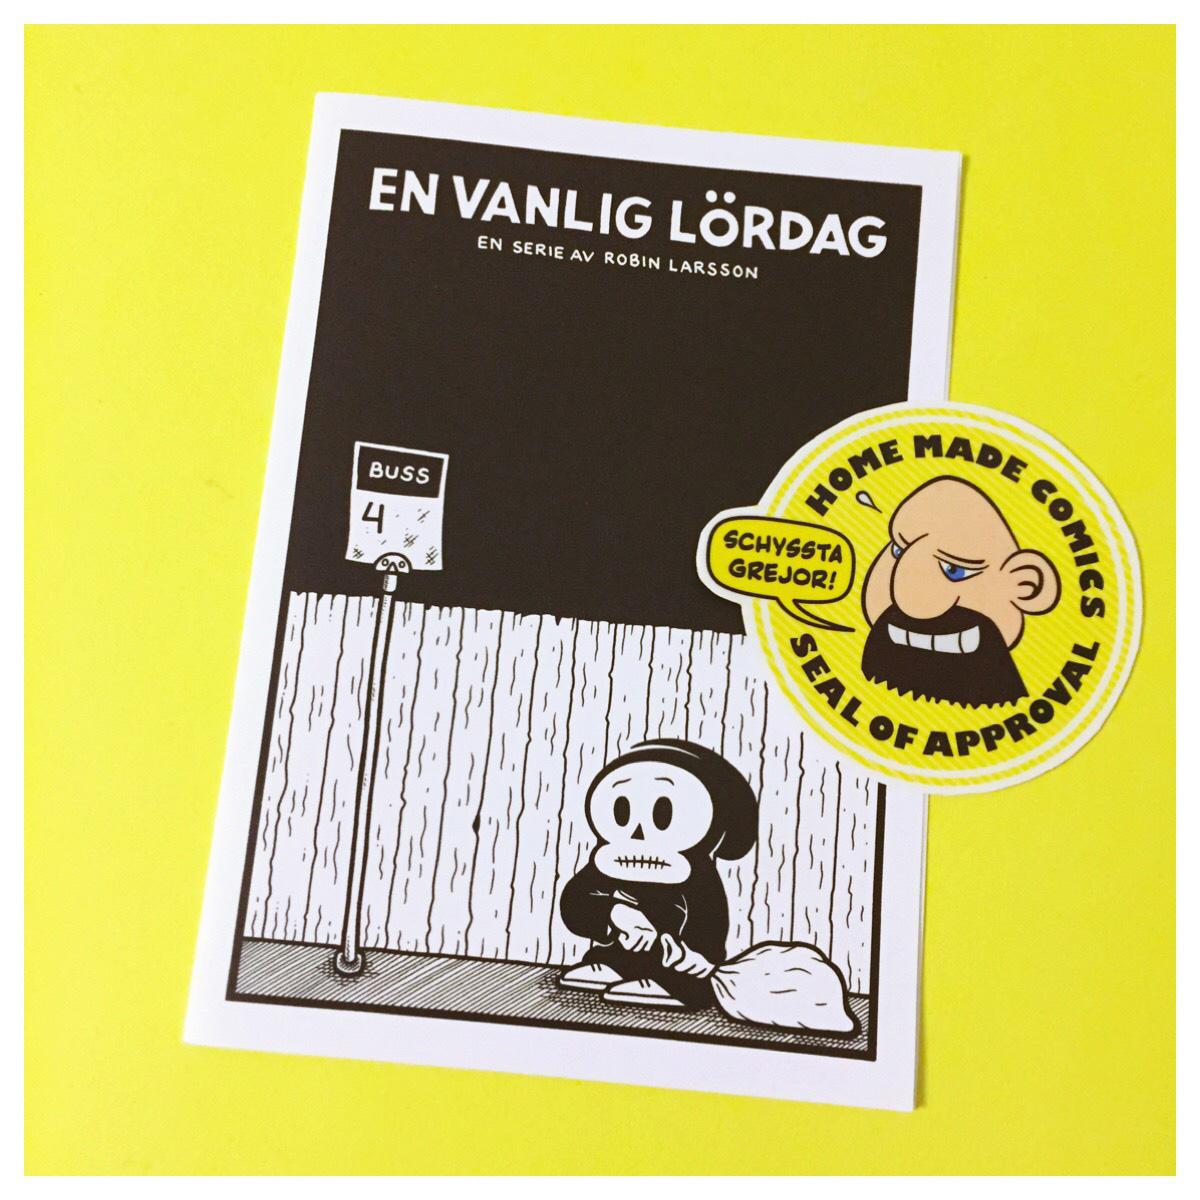 Home Made Comics Seal of Approval #155. En vanlig lördag av Robin Larsson utgiven 2016.